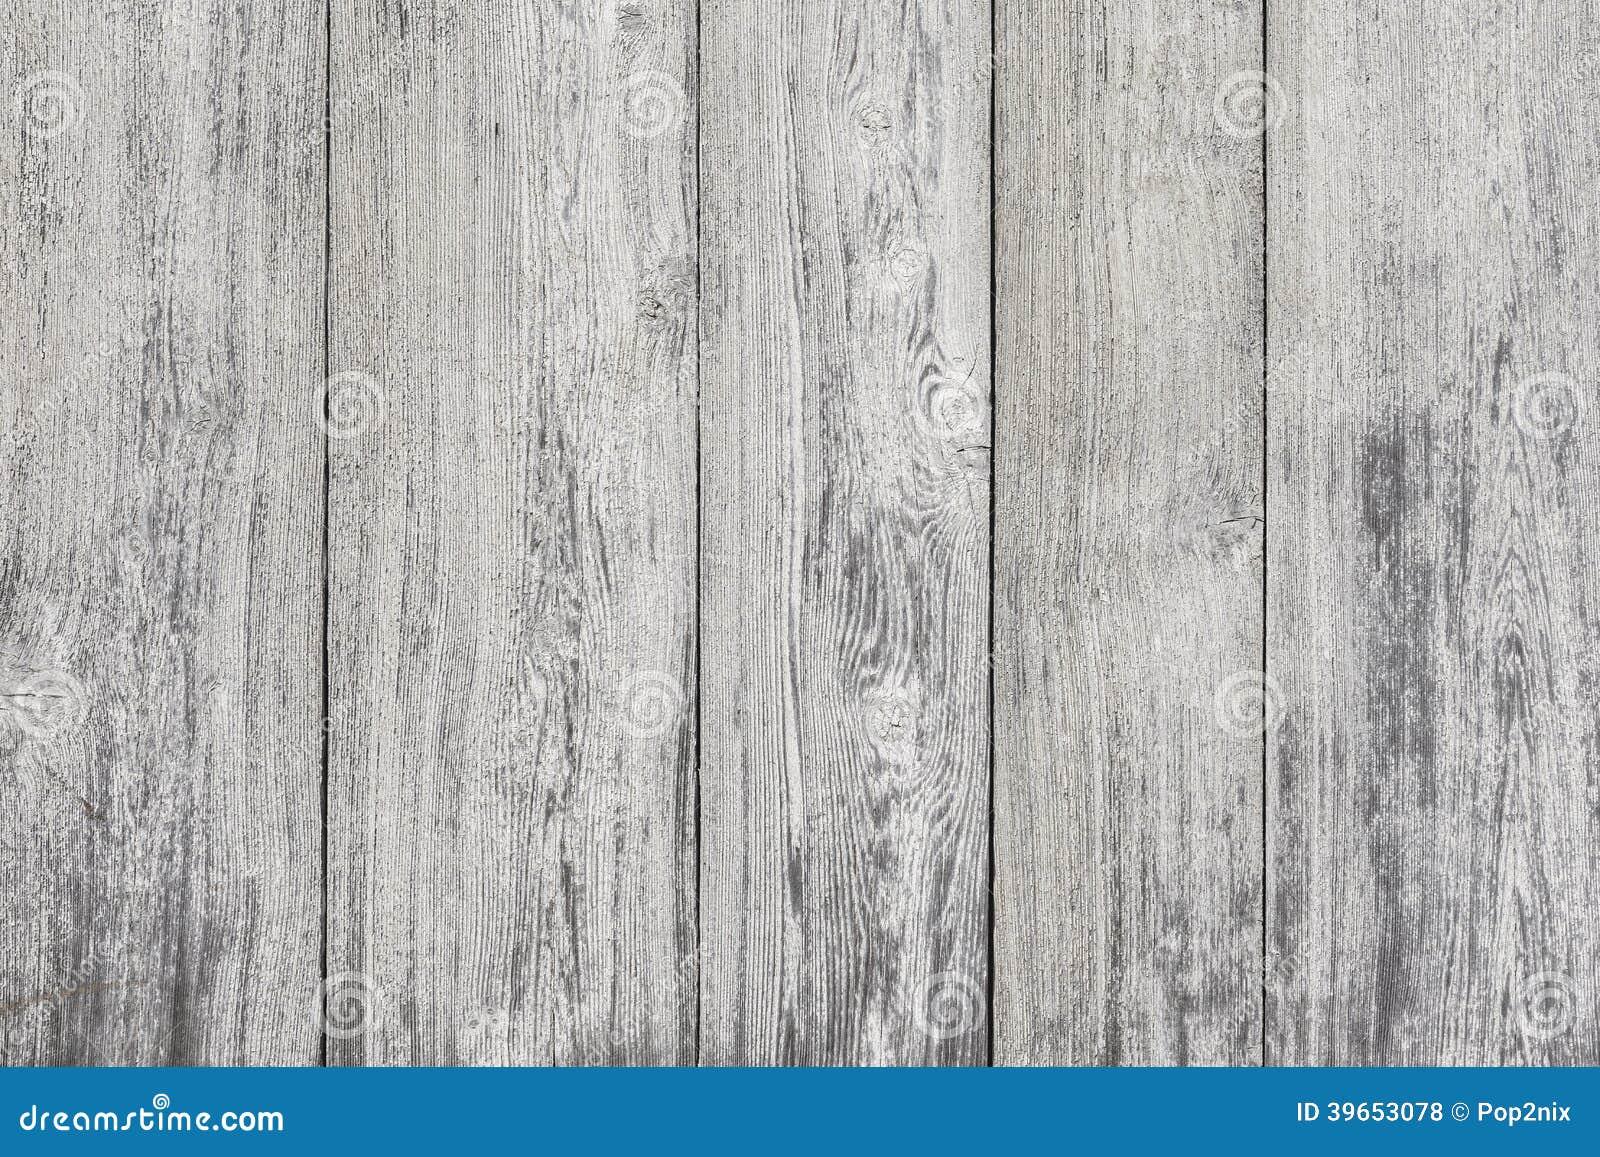 White Wood Texture Background Stock Photo Image 39653078